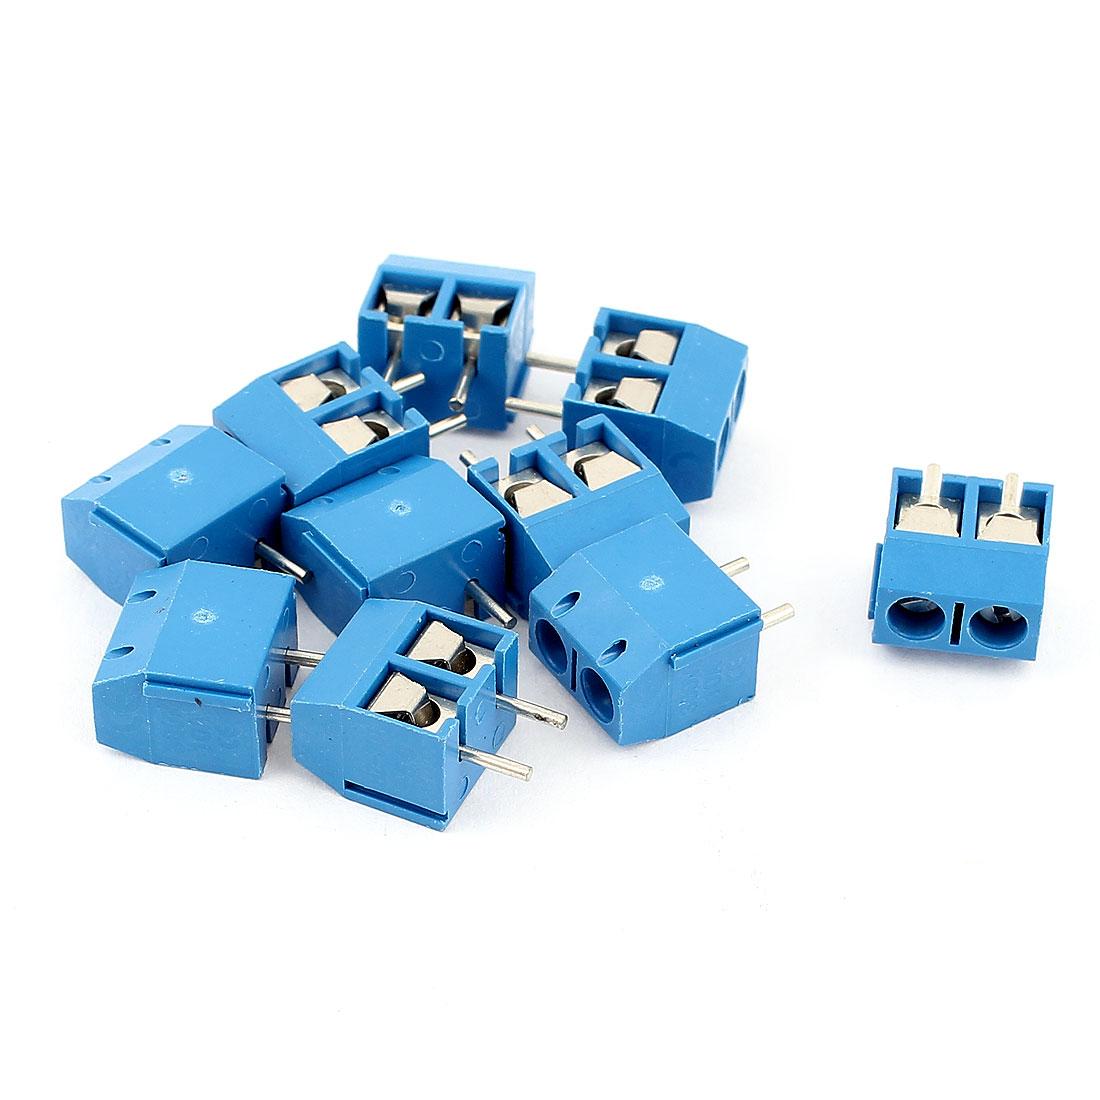 10 Pcs AC 300V 10A PCB Terminal Block Connector 5.0mm Pitch Blue